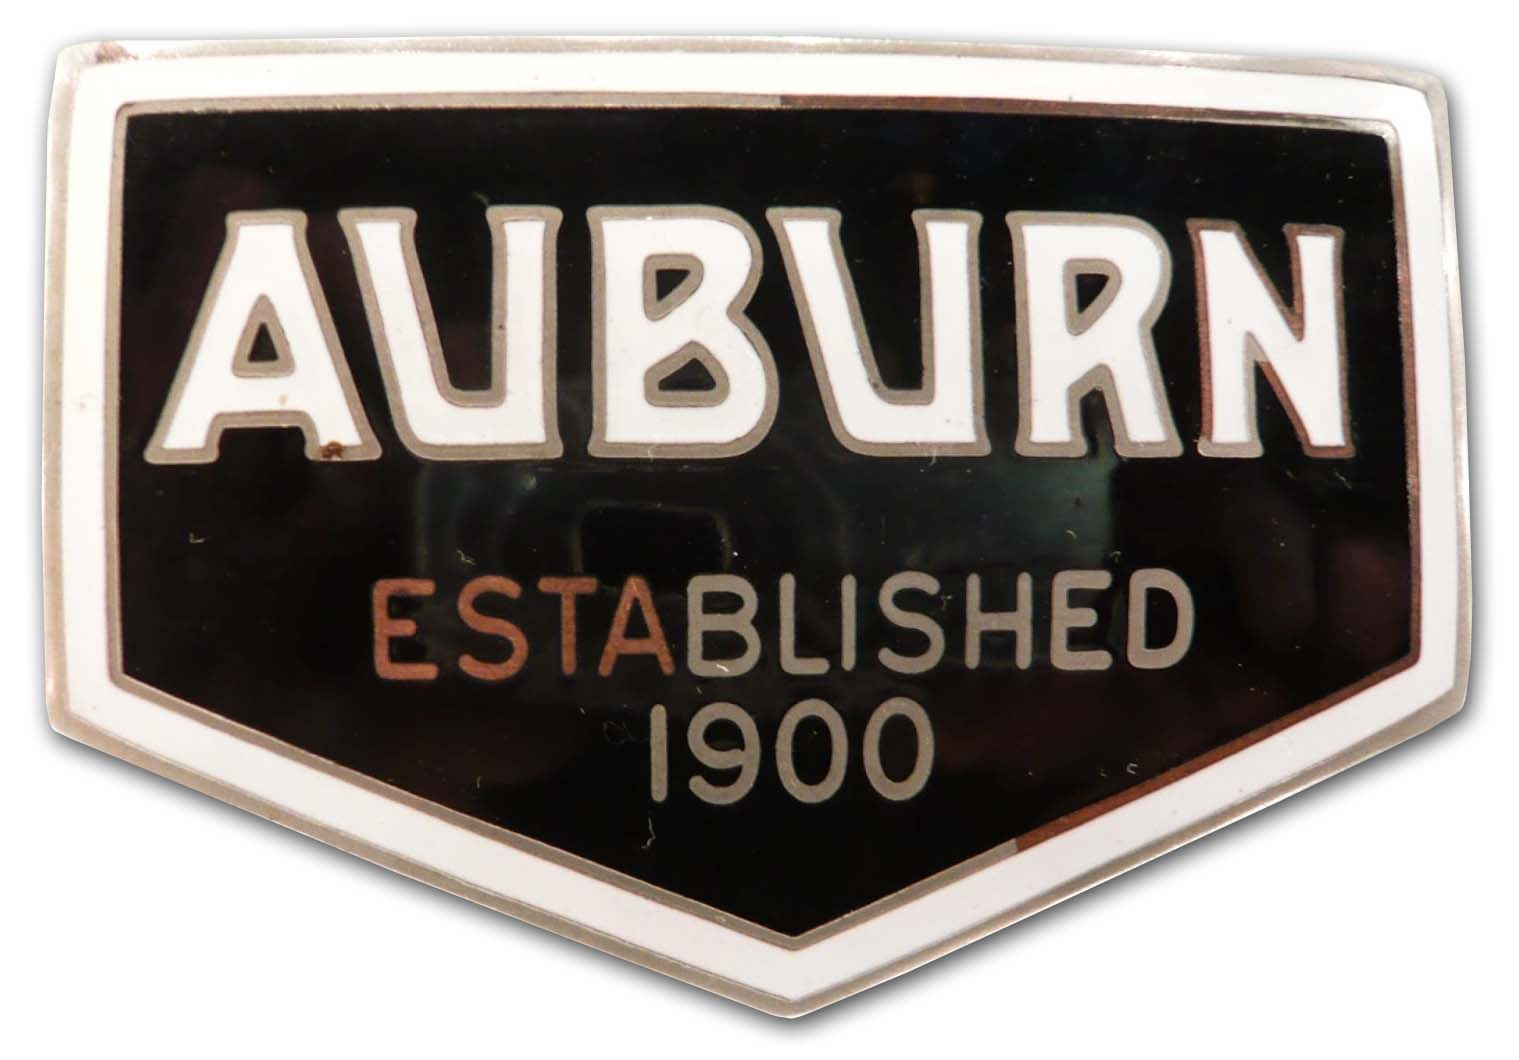 Auburn (1924-1930 grill emblem)